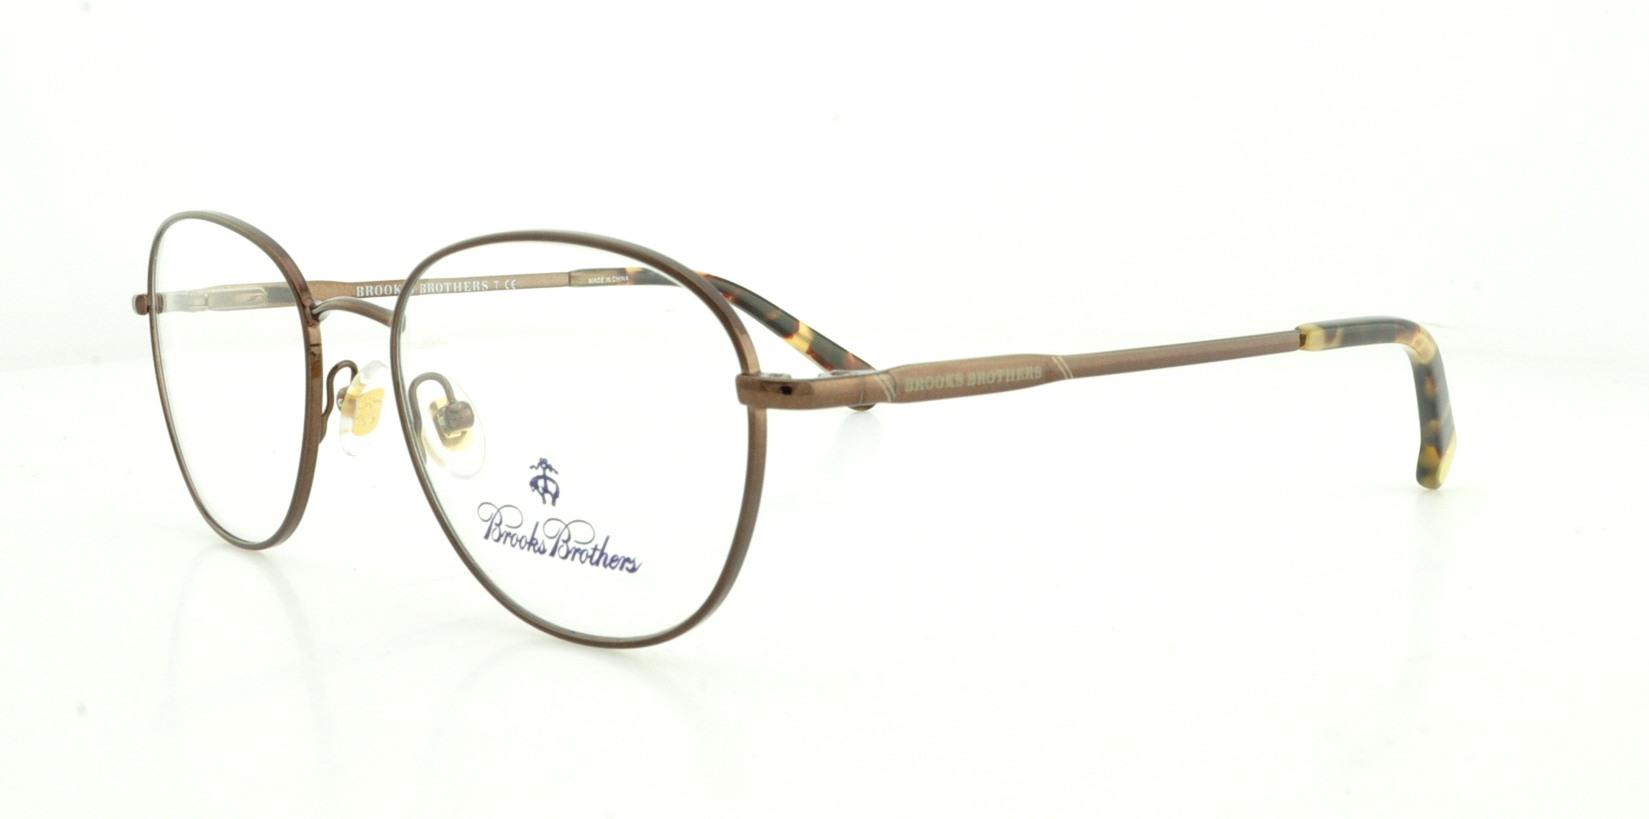 0986d2a7de Brooks Brothers BB 1026 1538 Frames Eyeglasses 50mm - 19